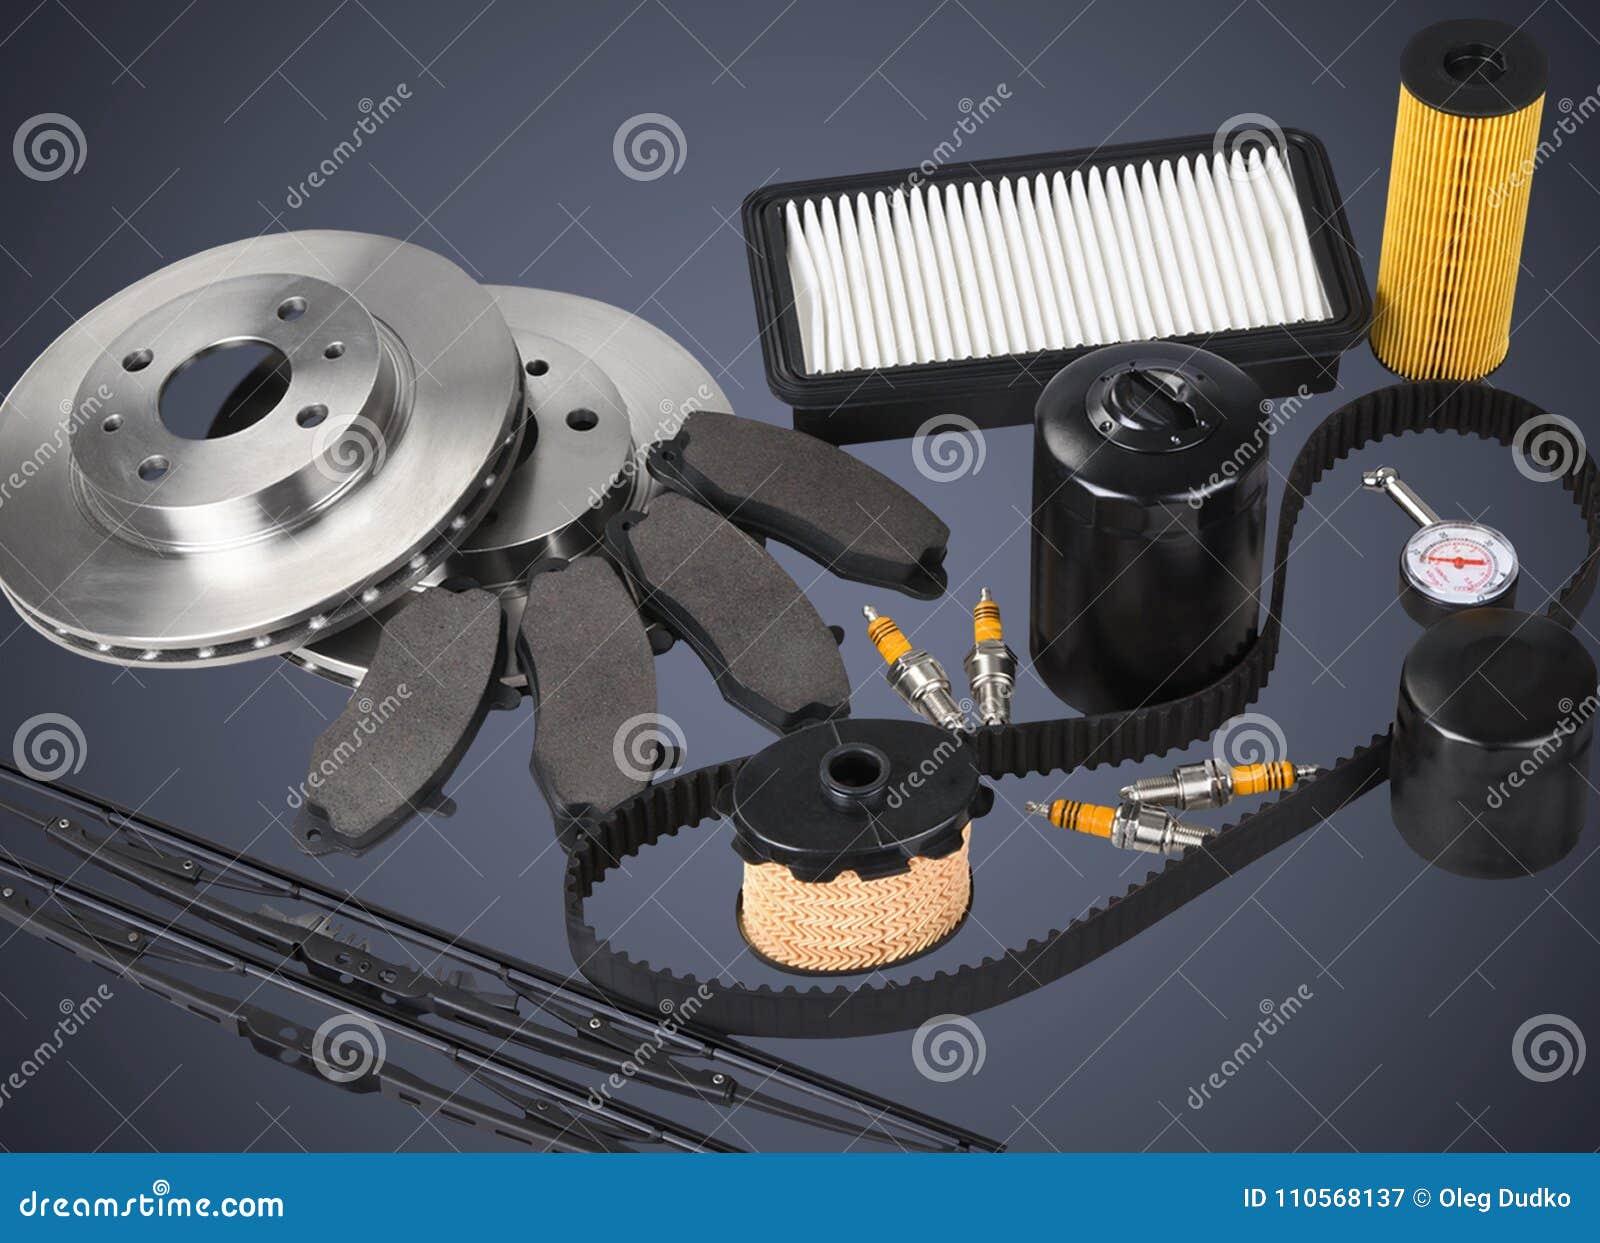 Wipers, Lotniczy filtry, Iskrowe prymki, krzywka pasek I